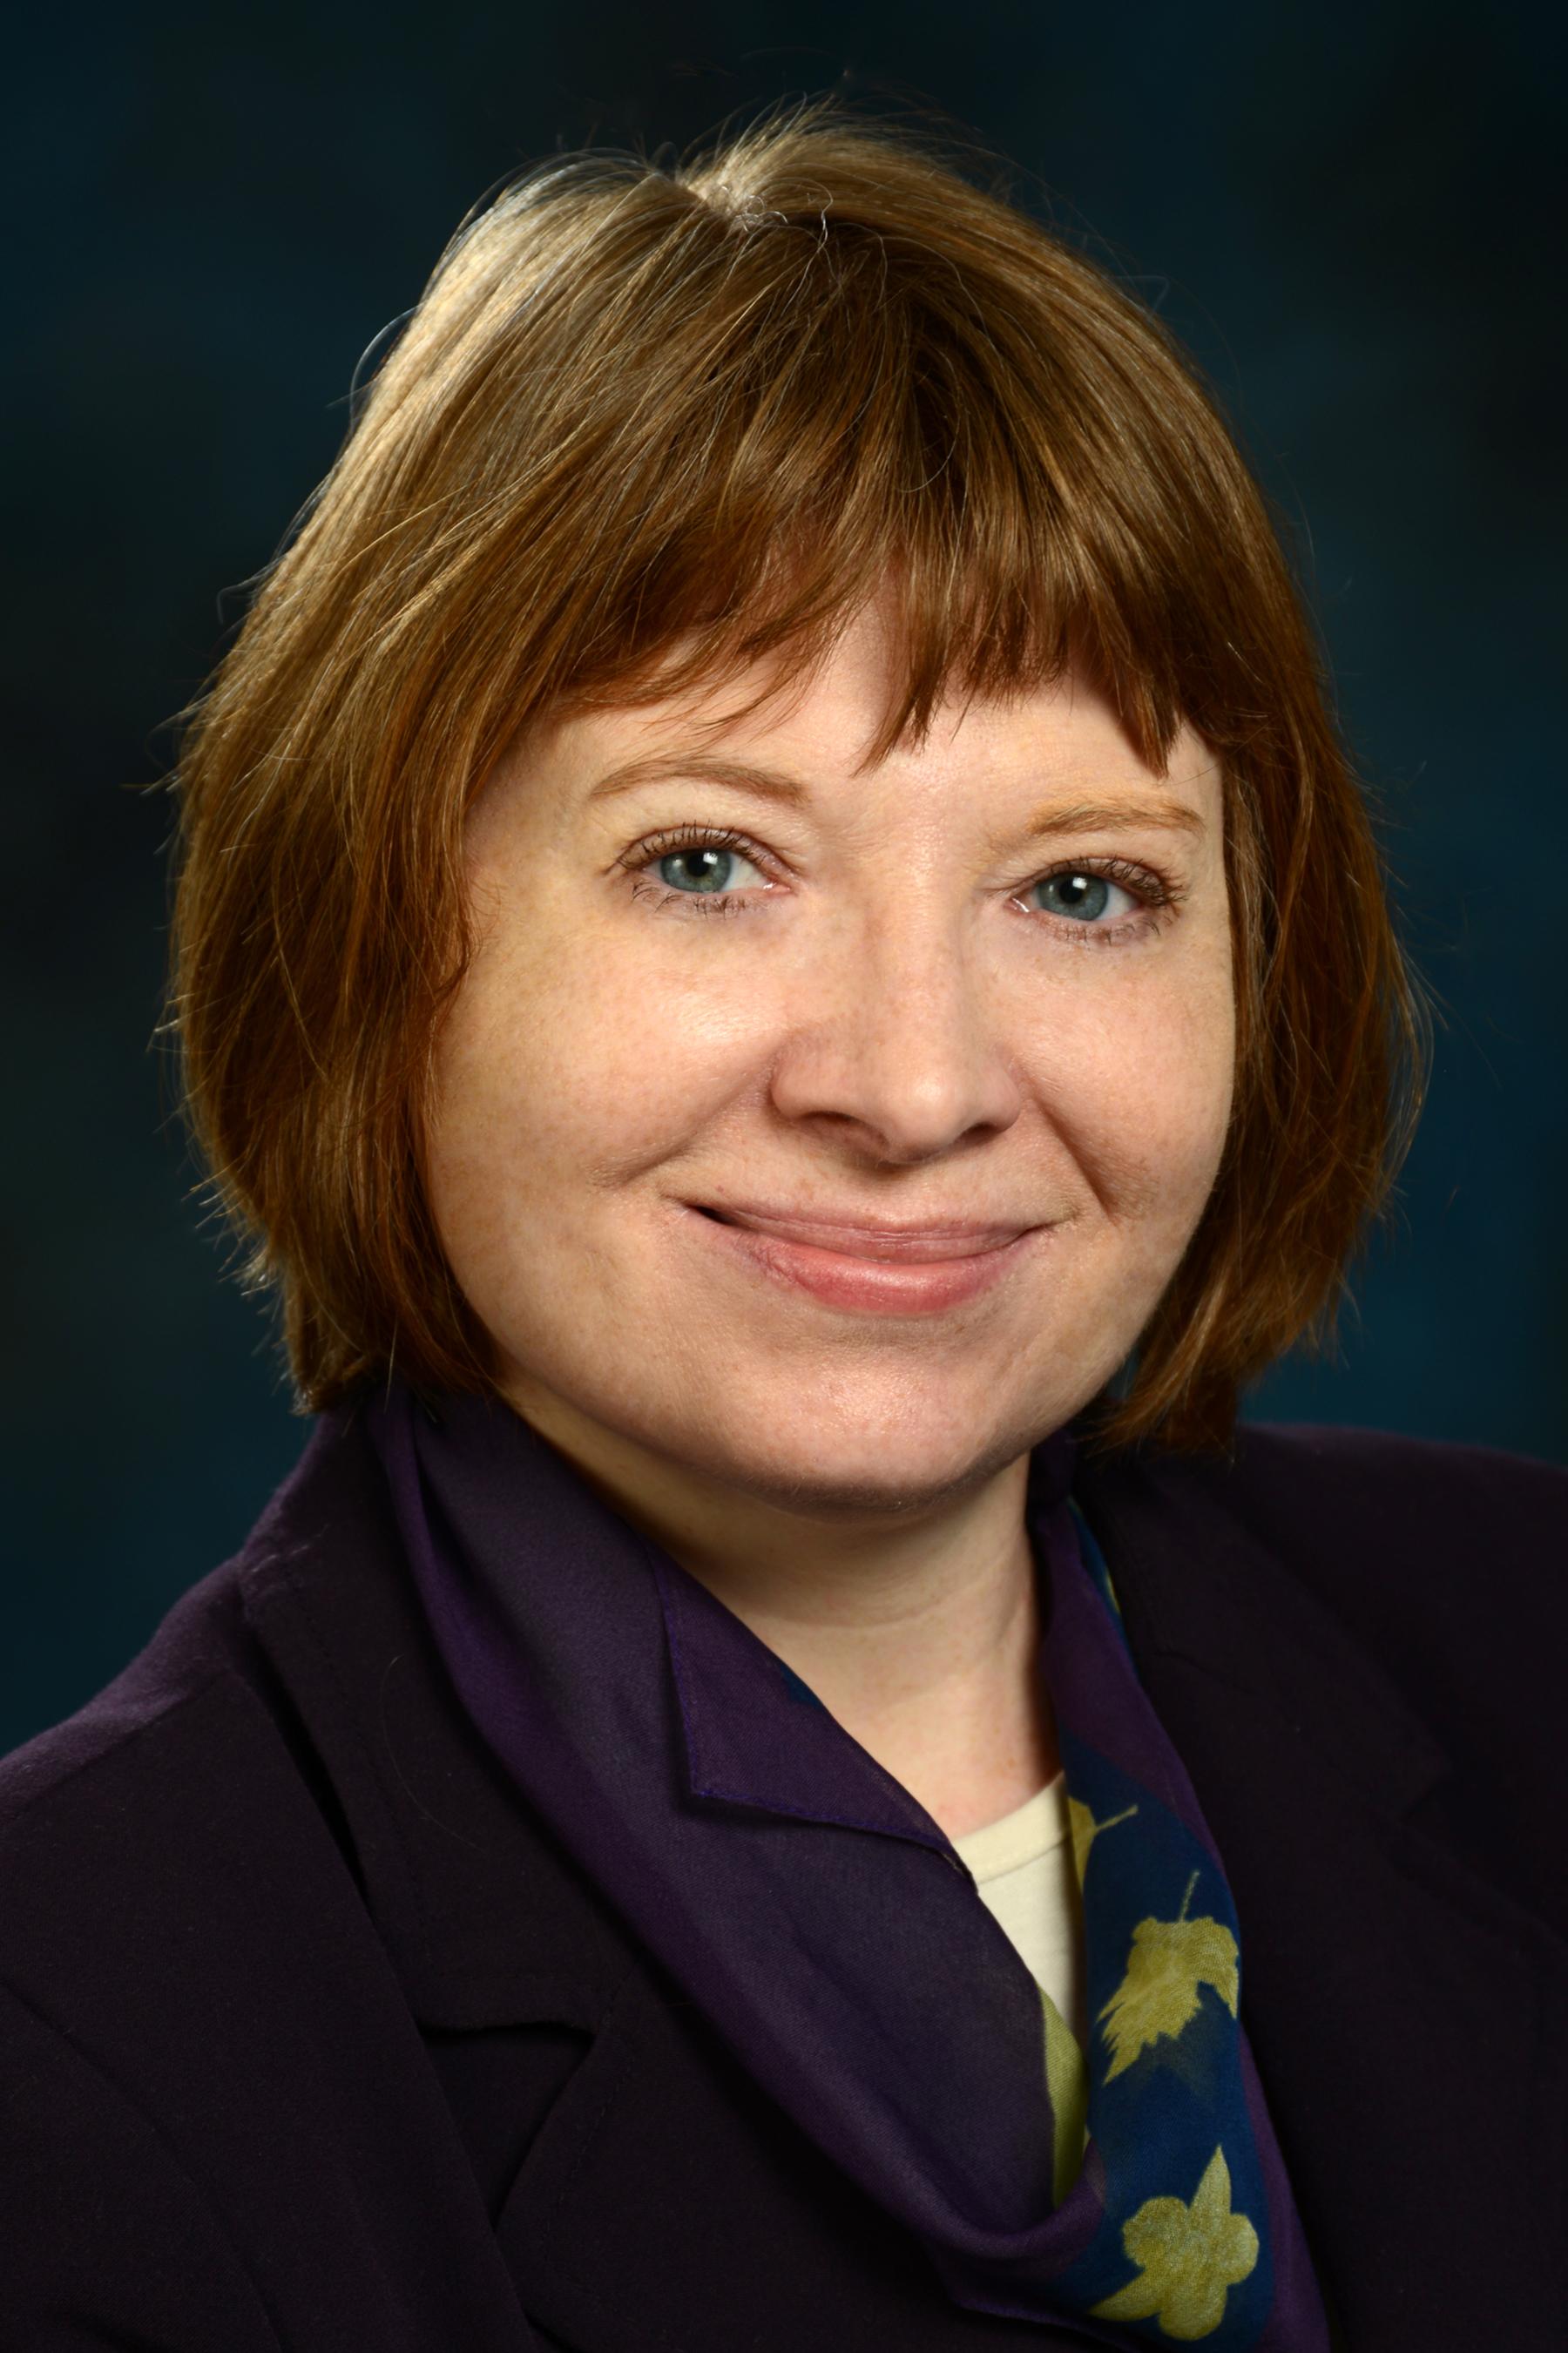 Pamela Newland